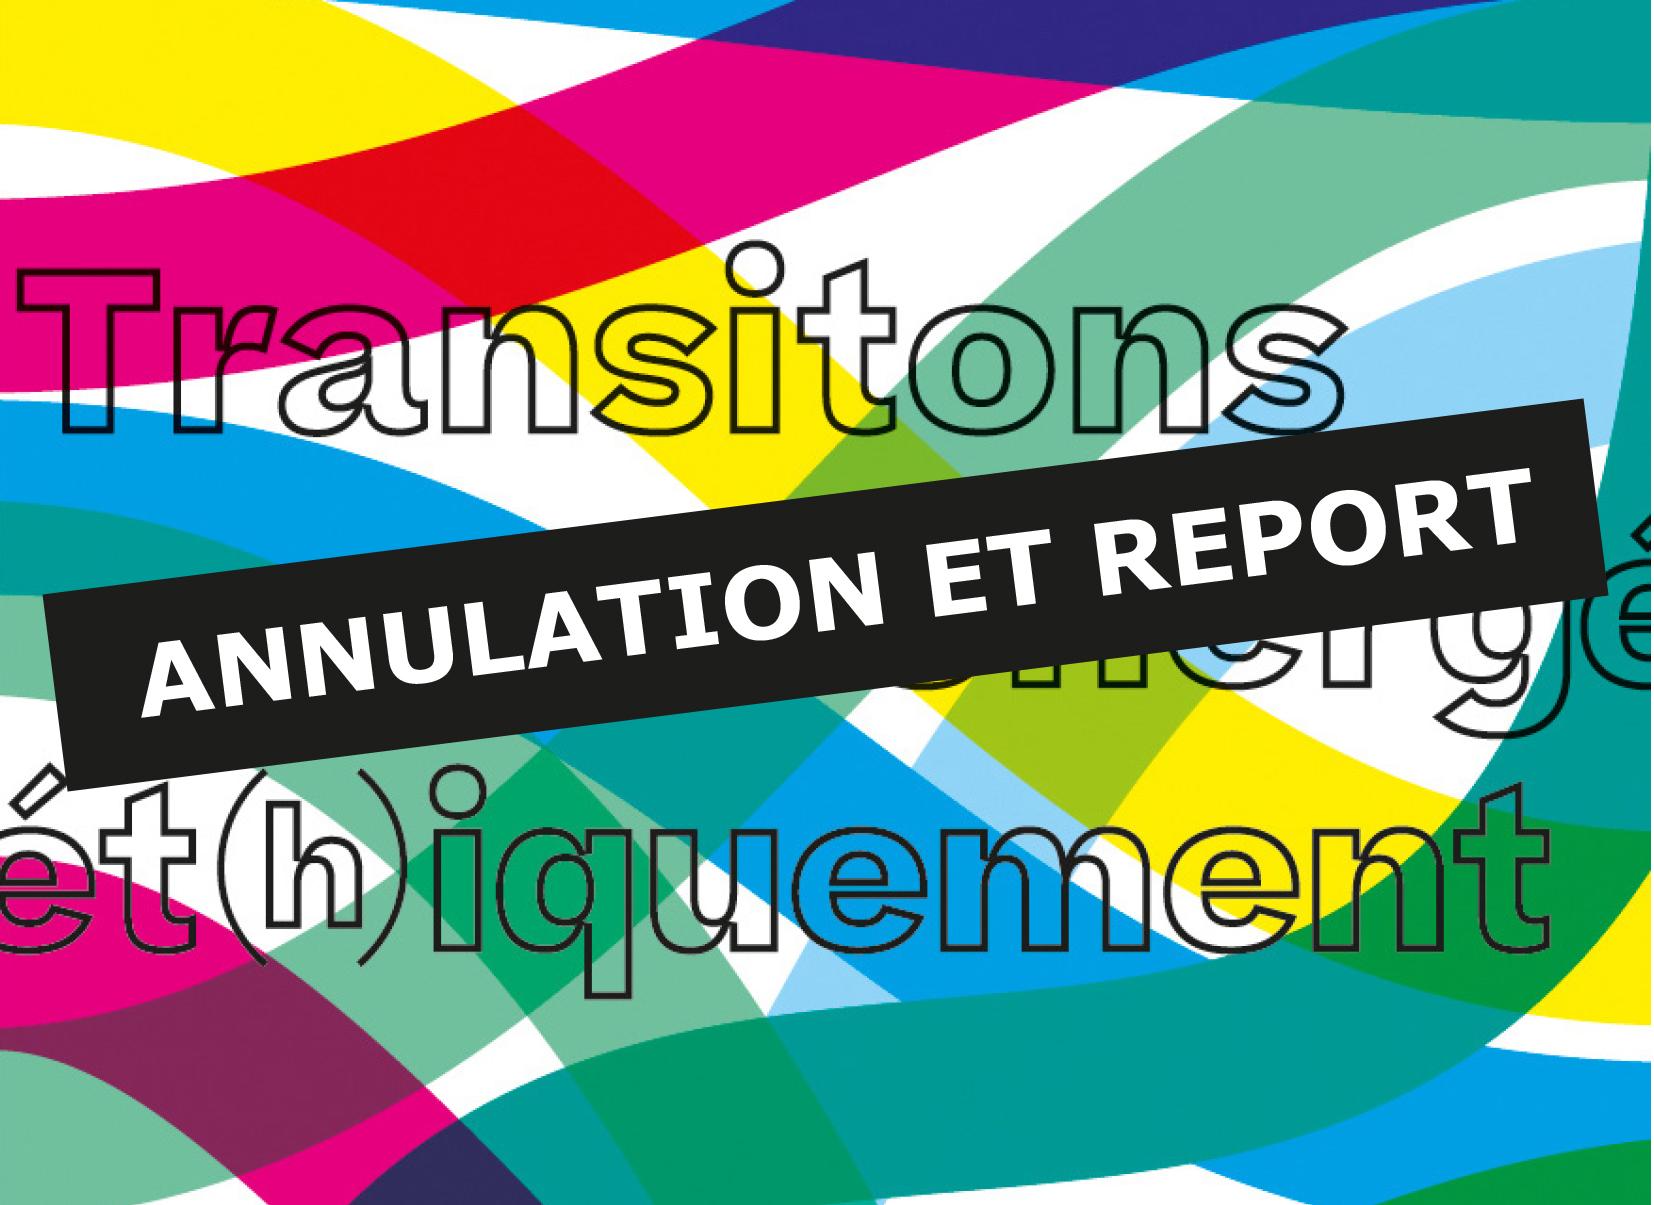 te_annulation_et_report_.jpg